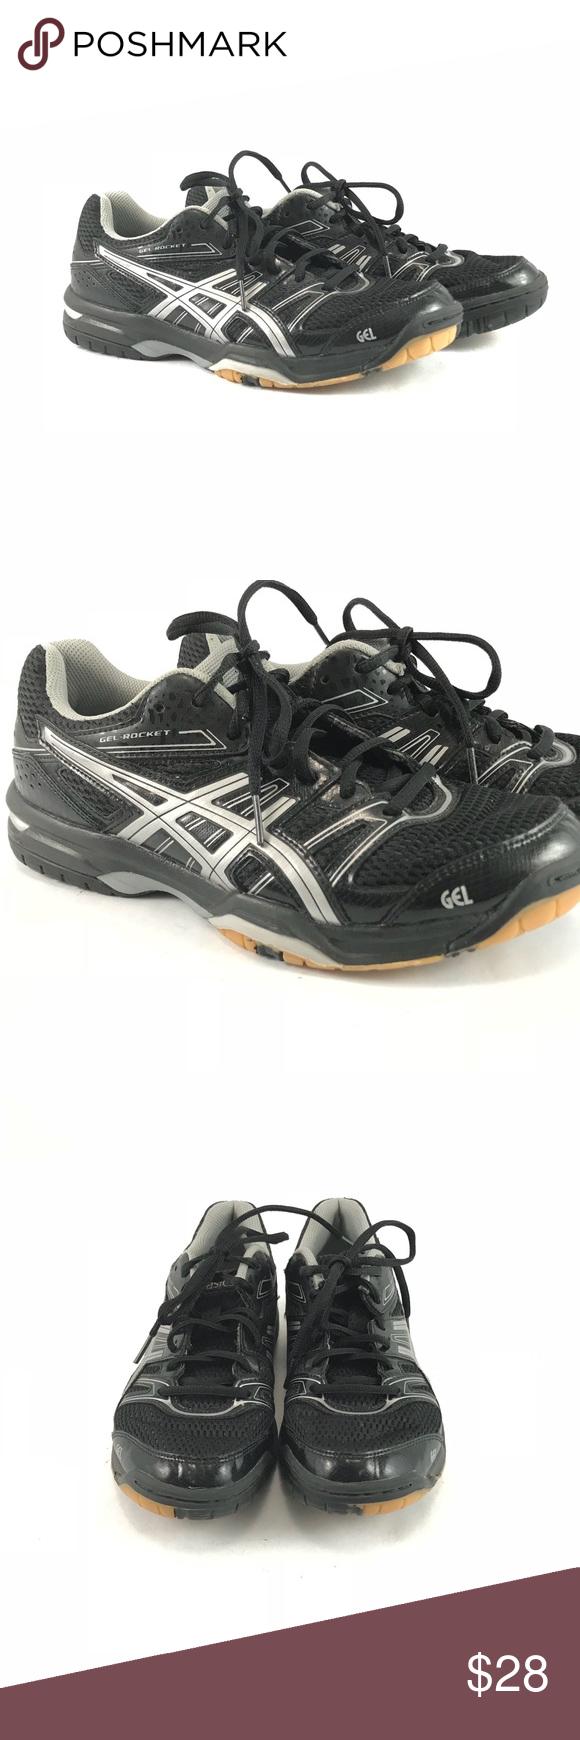 Black Asics Gel Rocket Sneakers Woman S Size 8 Black Asics Asics Gel Volleyball Shoes